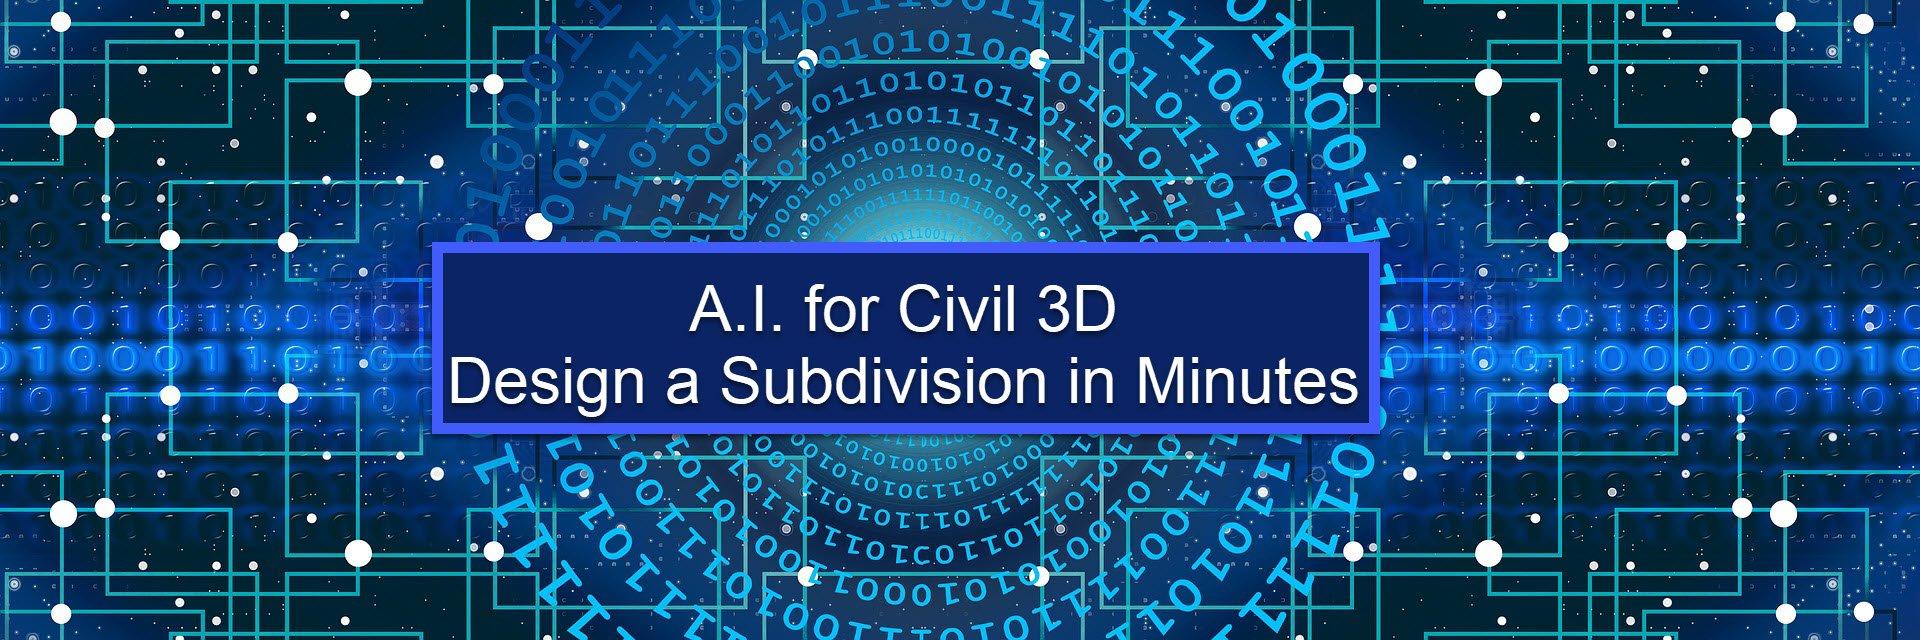 AI for Civil 3D